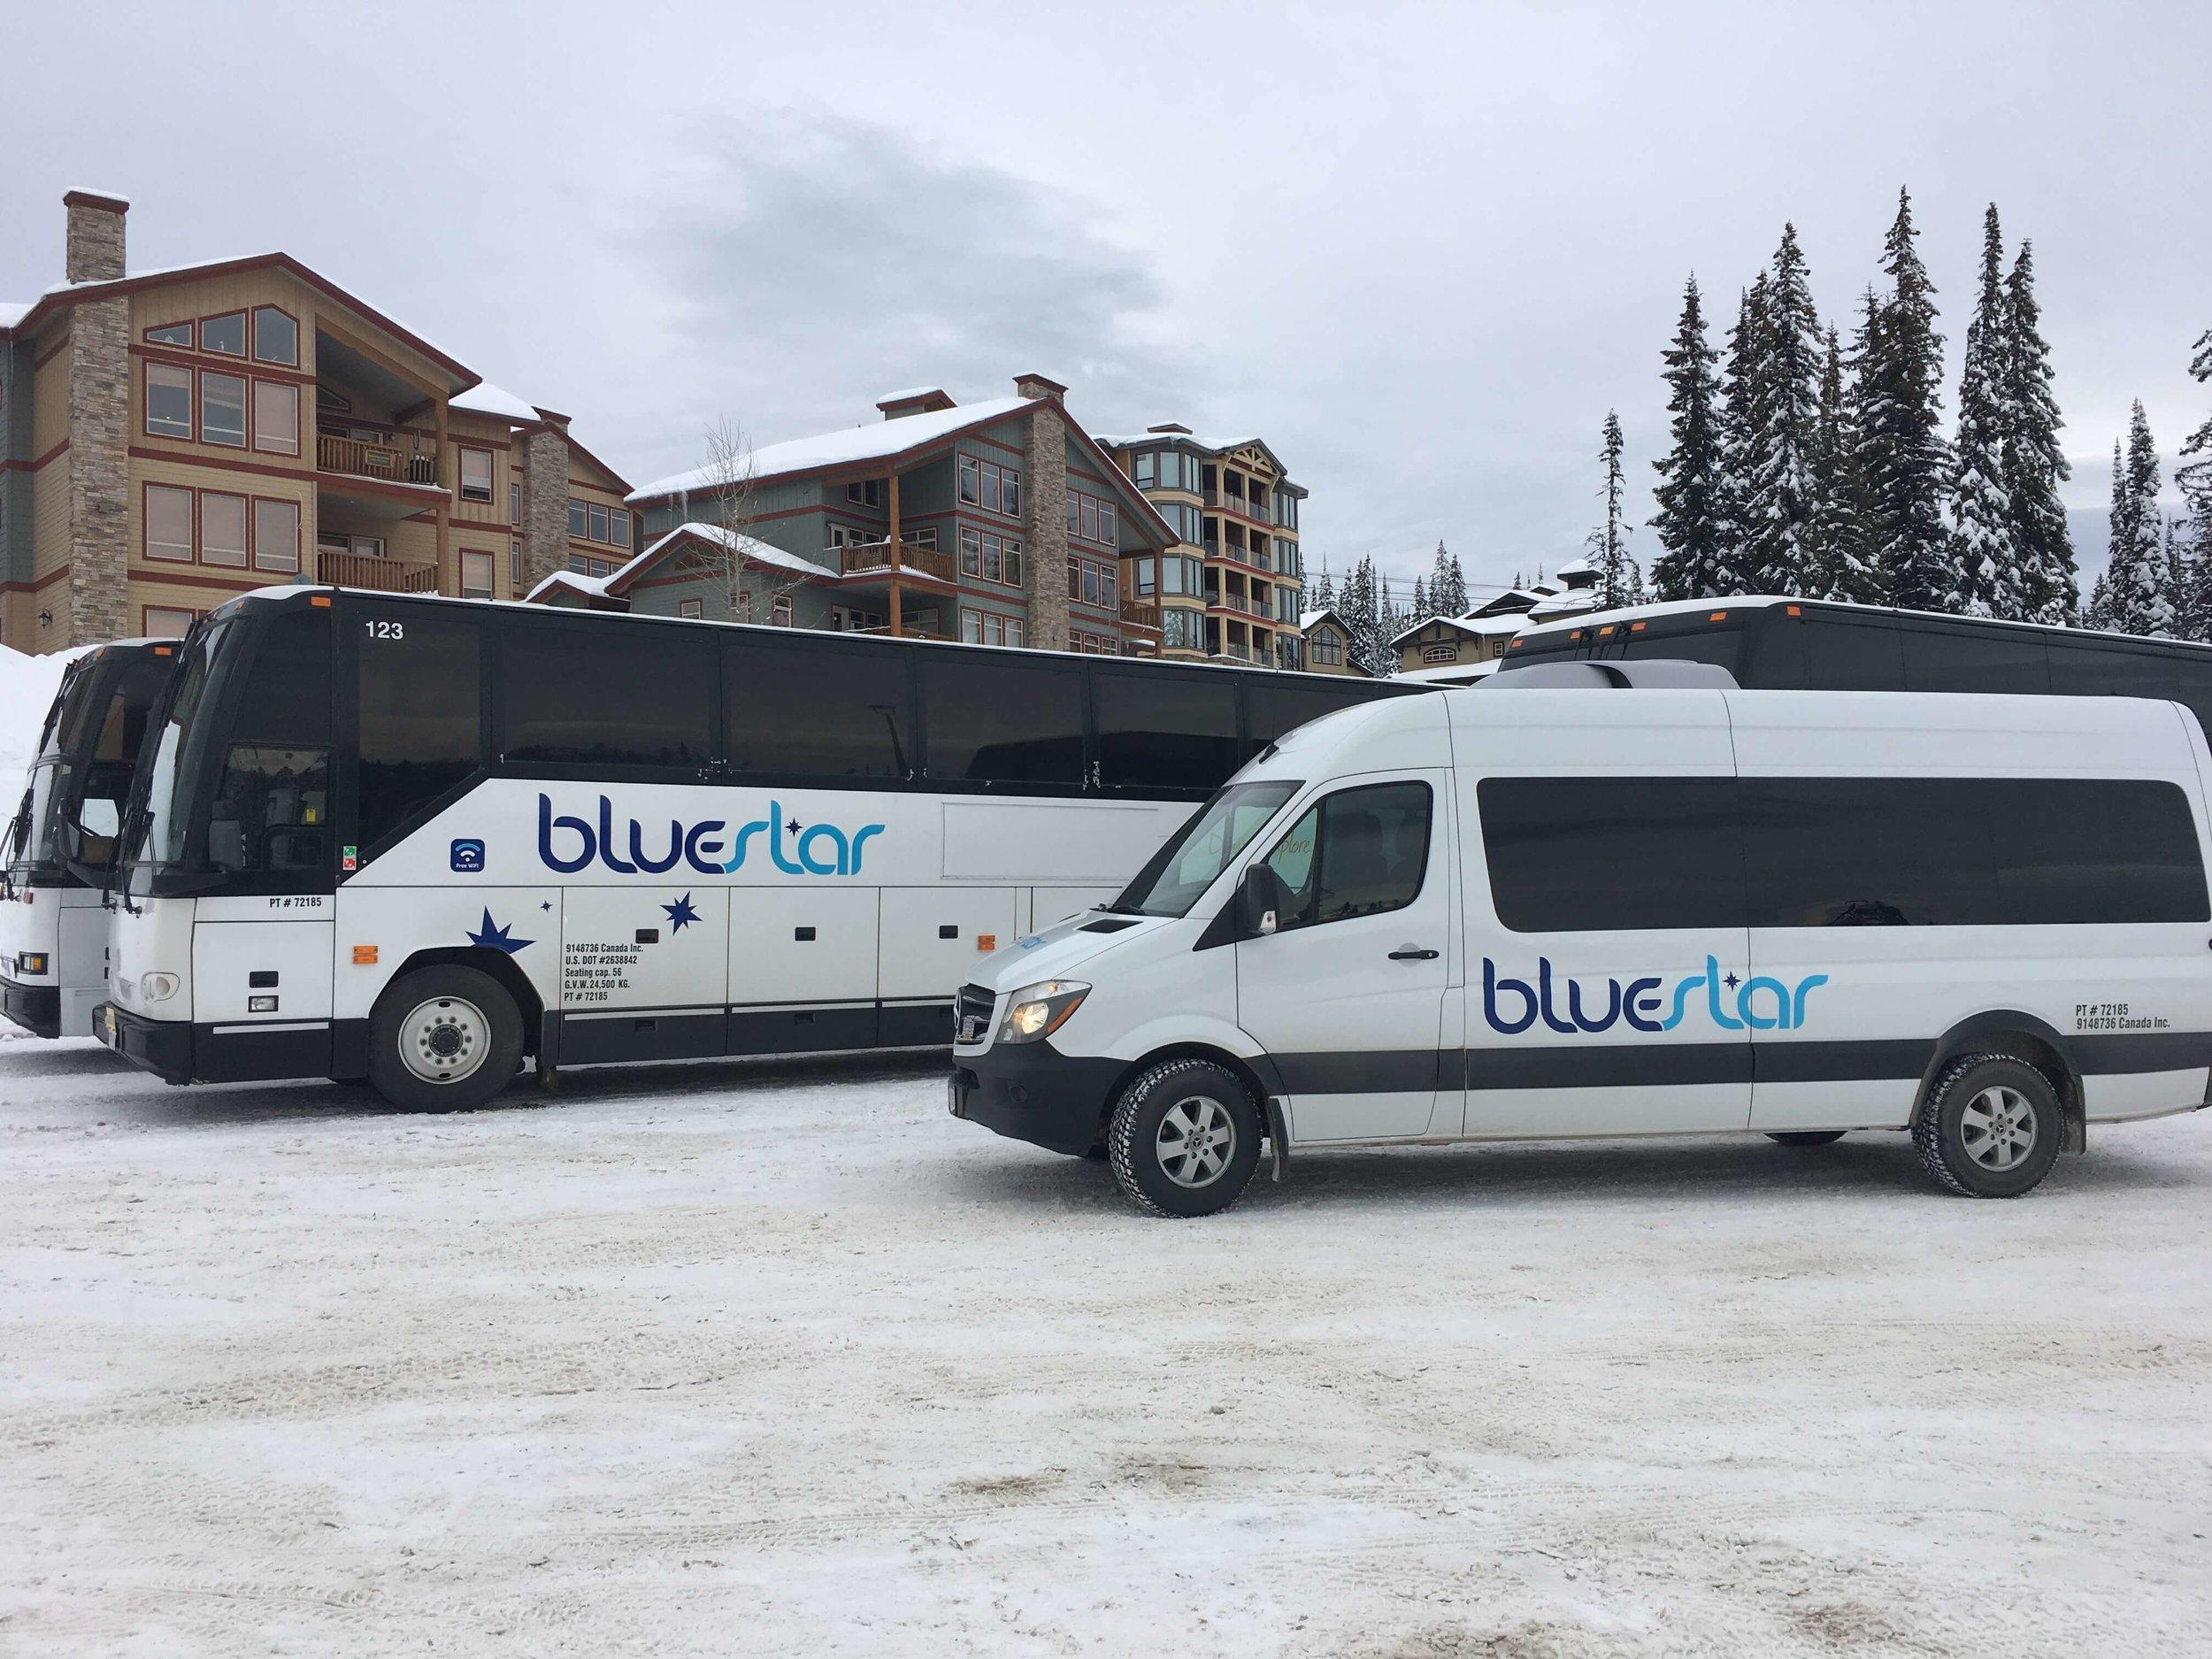 Bluestar Coachlines at Big White